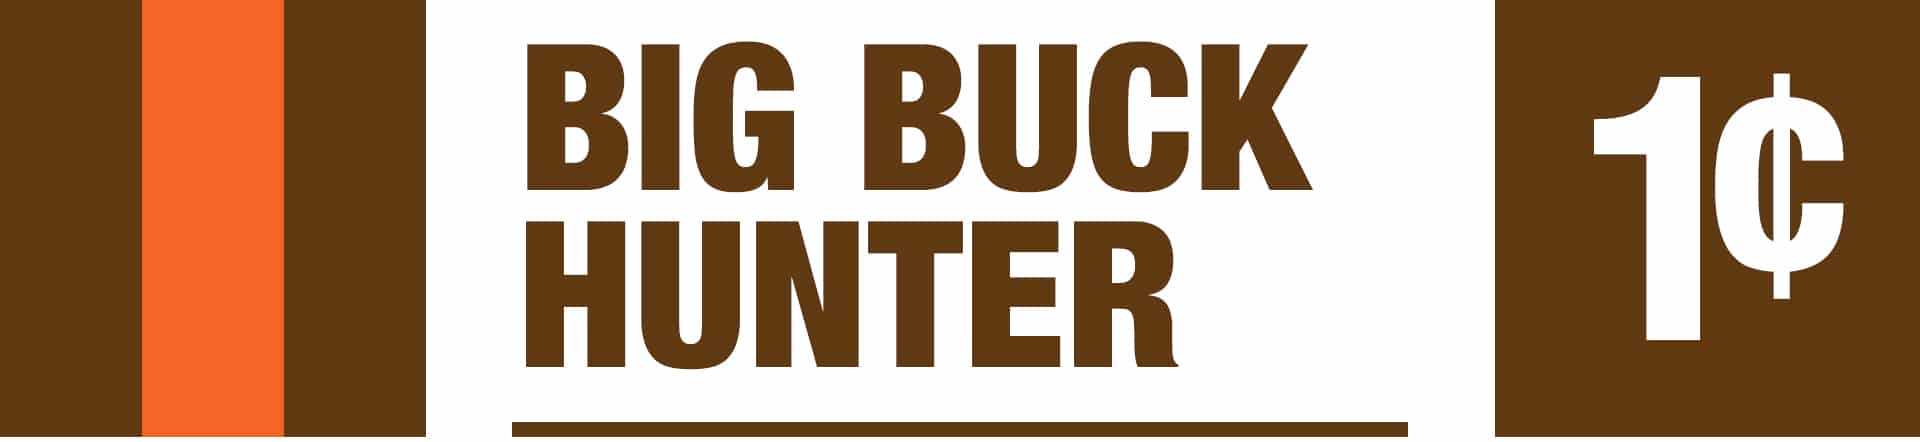 Big Buck Hunter - Penny Jackpot